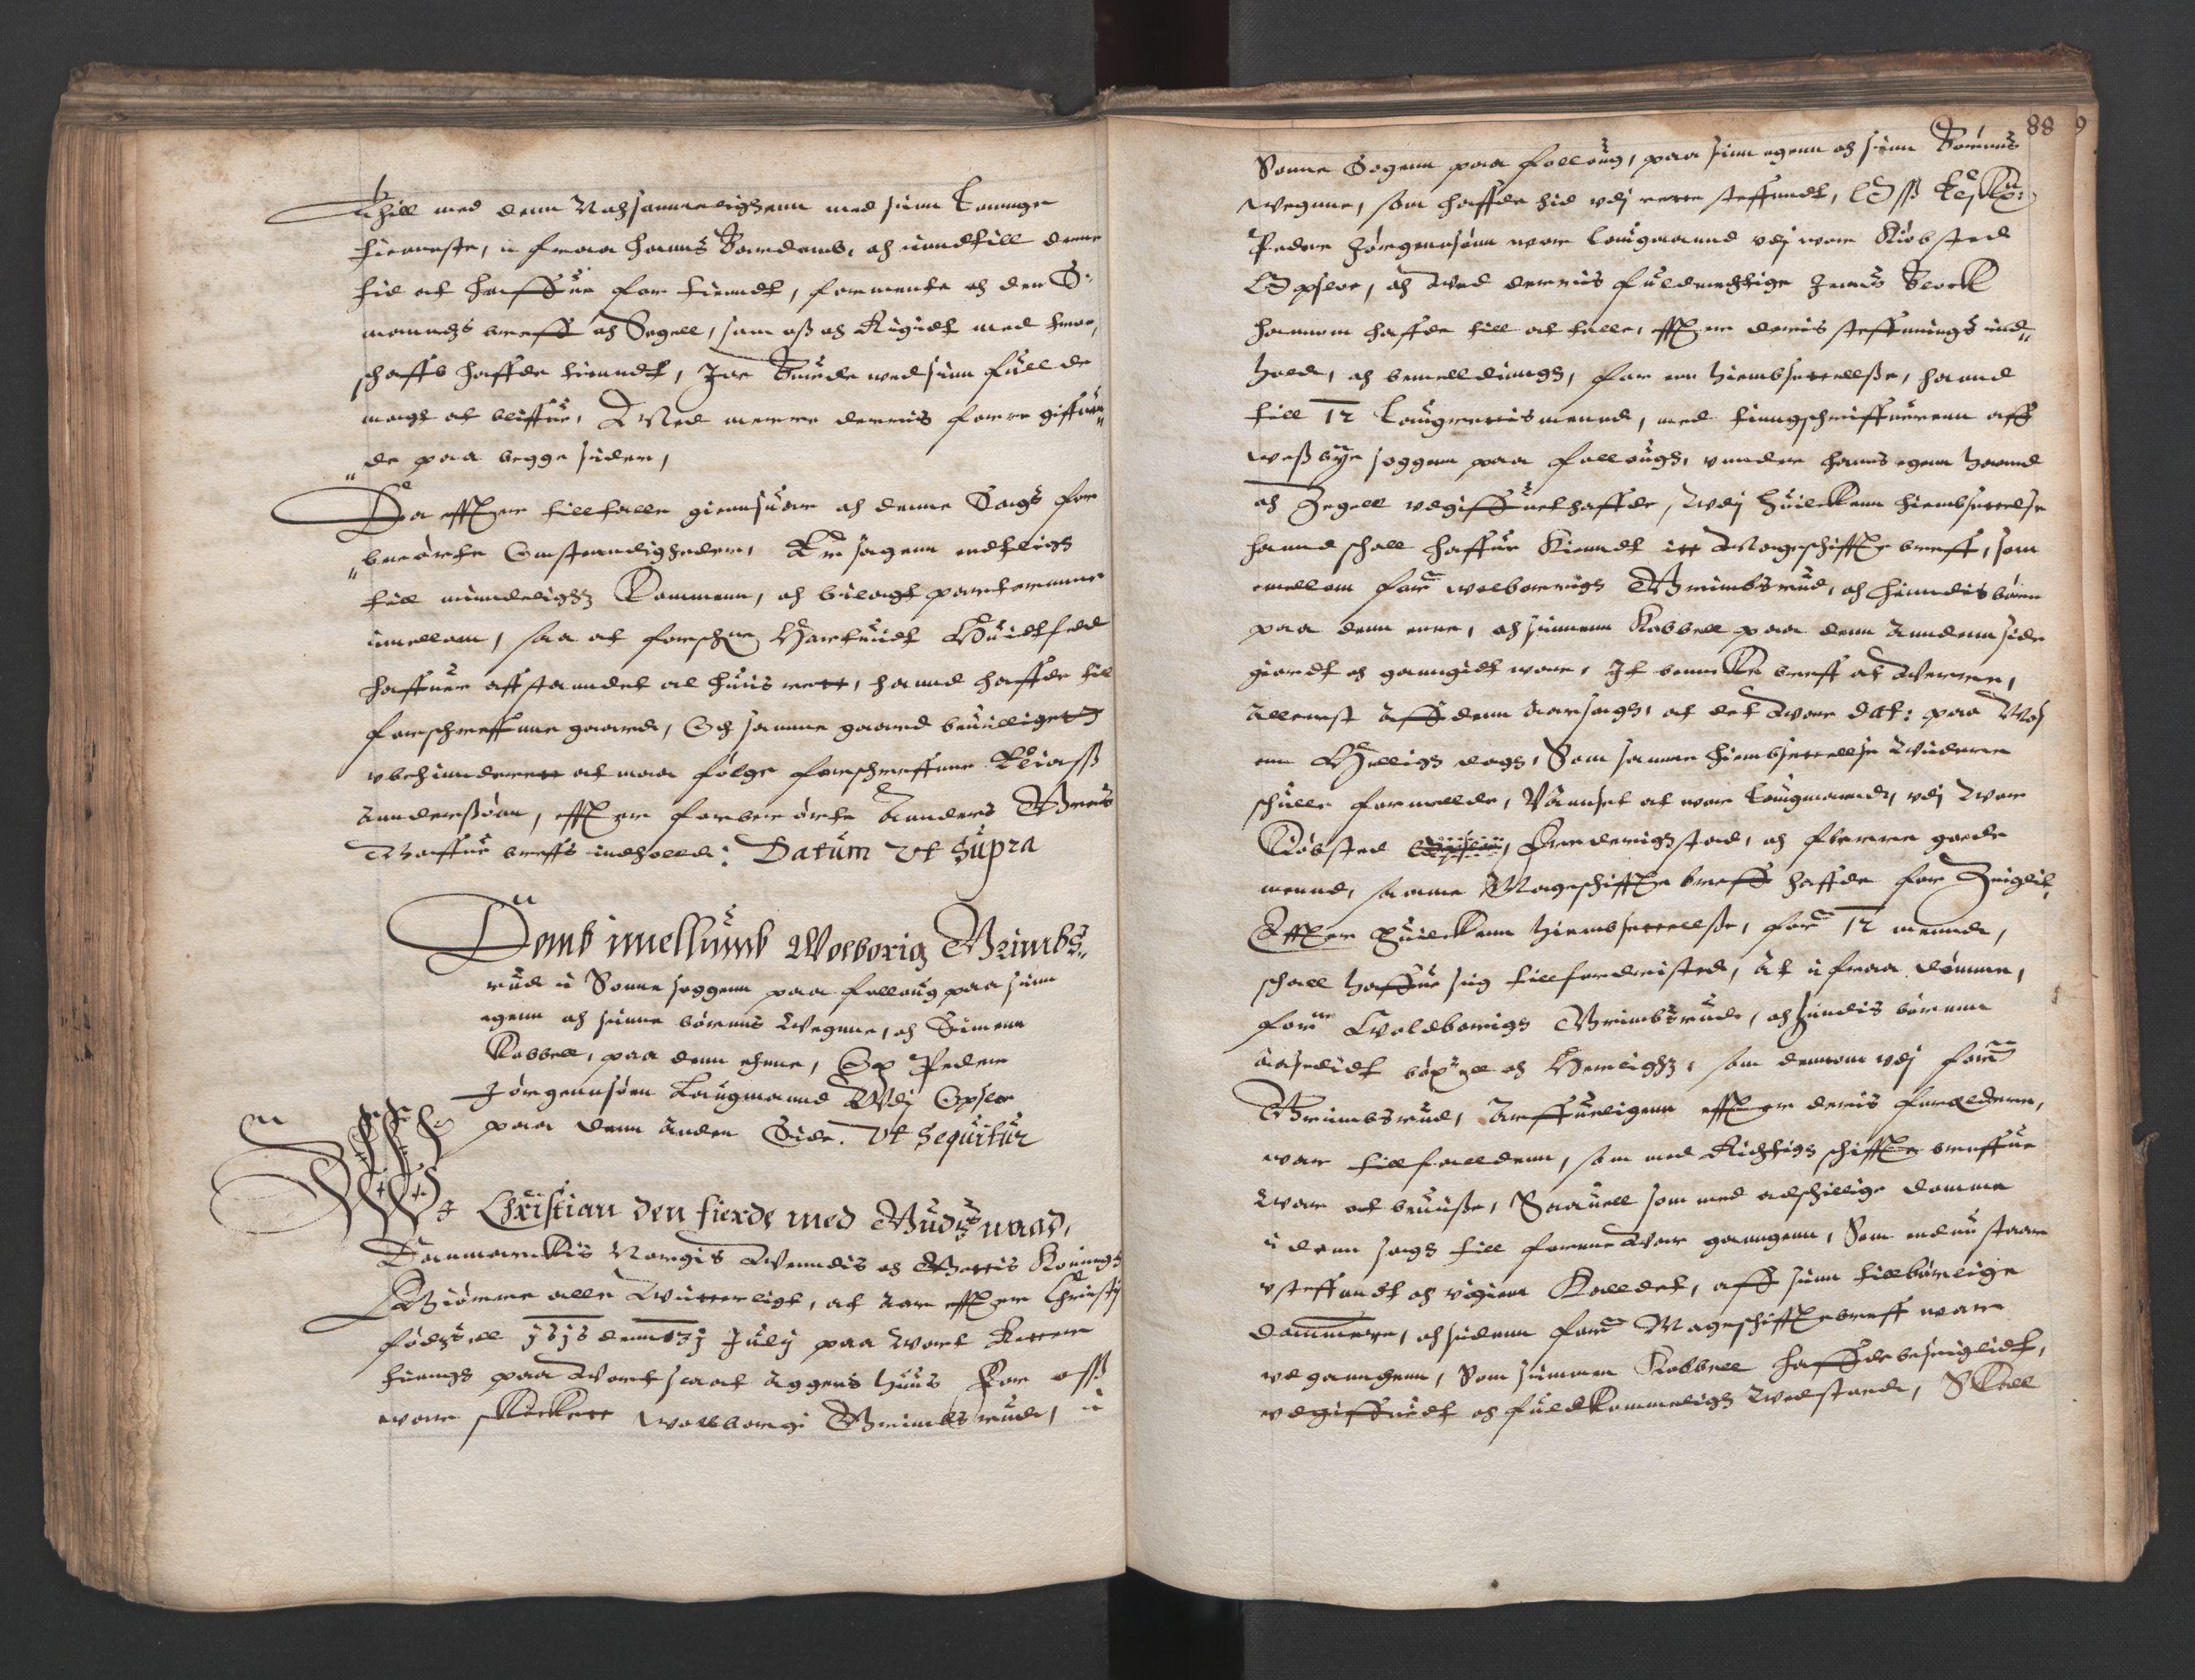 RA, Herredagen 1539-1664  (Kongens Retterting), A/L0011: Dombok, 1616, s. 87b-88a